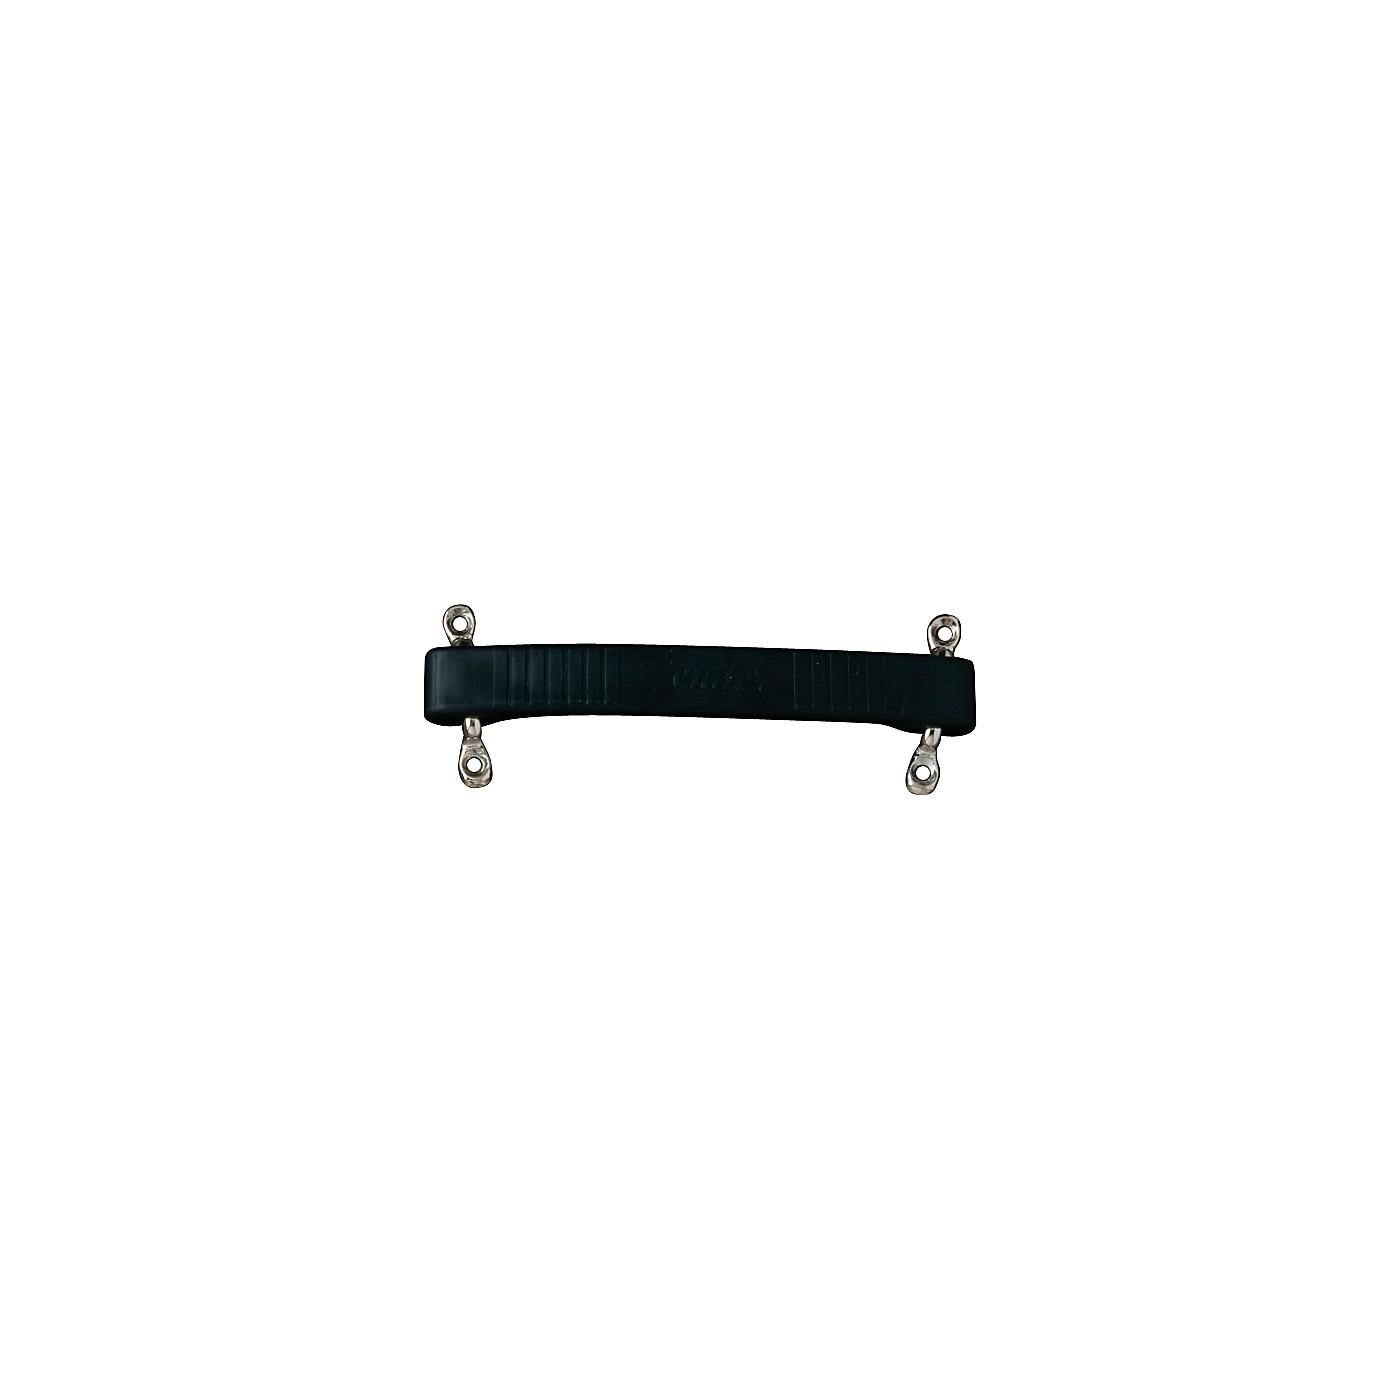 Fender Black Dogbone Amp Handle thumbnail